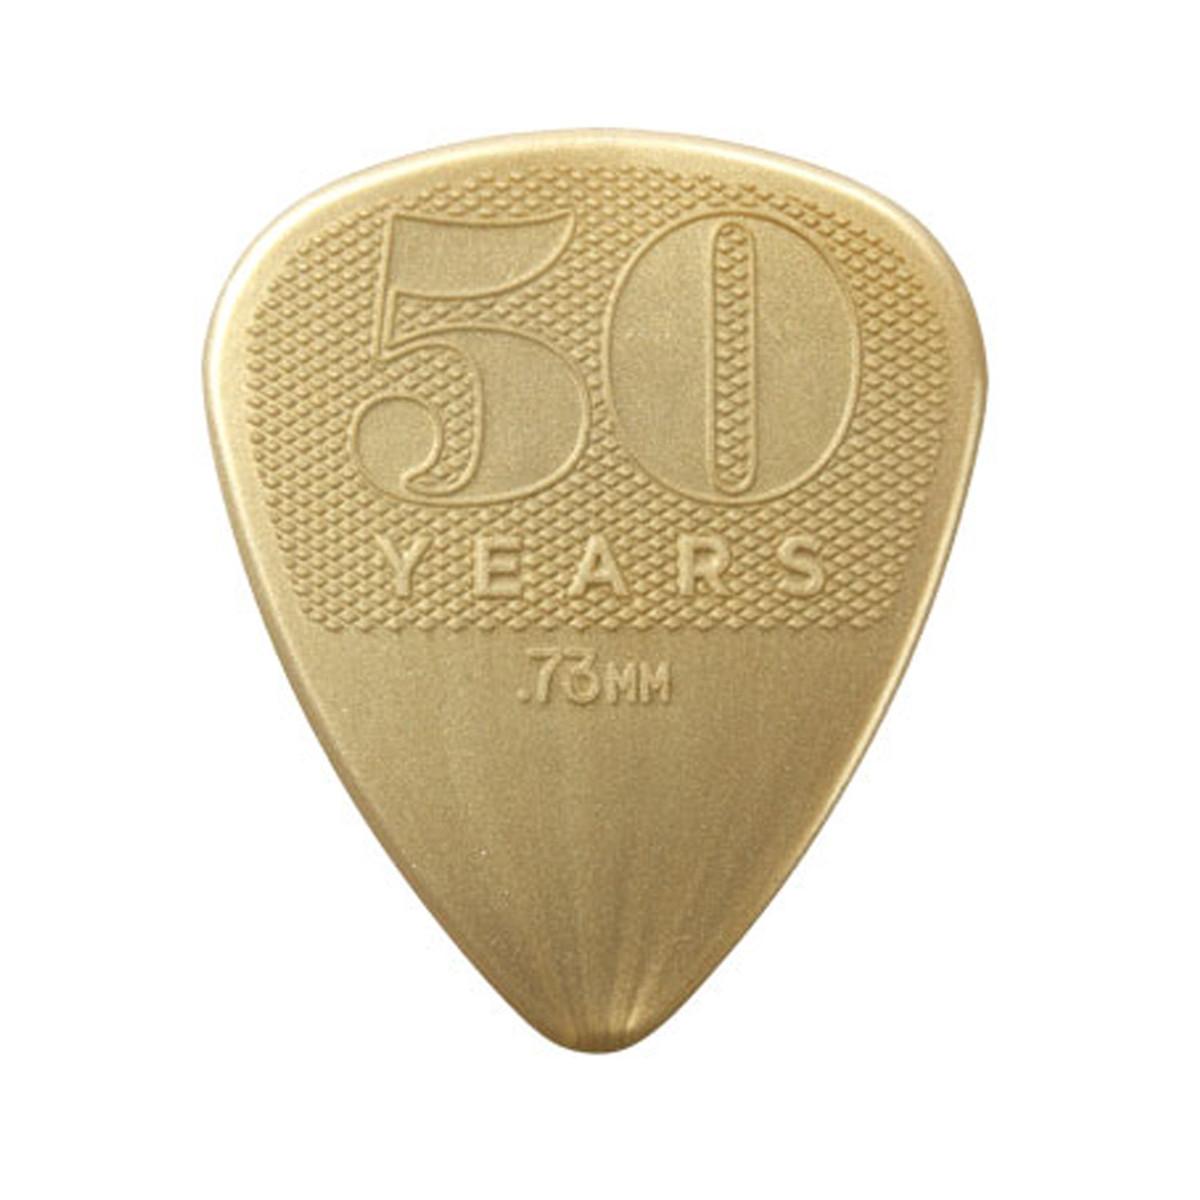 Image of Dunlop 50th Anniversary Gold Nylon Picks 0.73mm